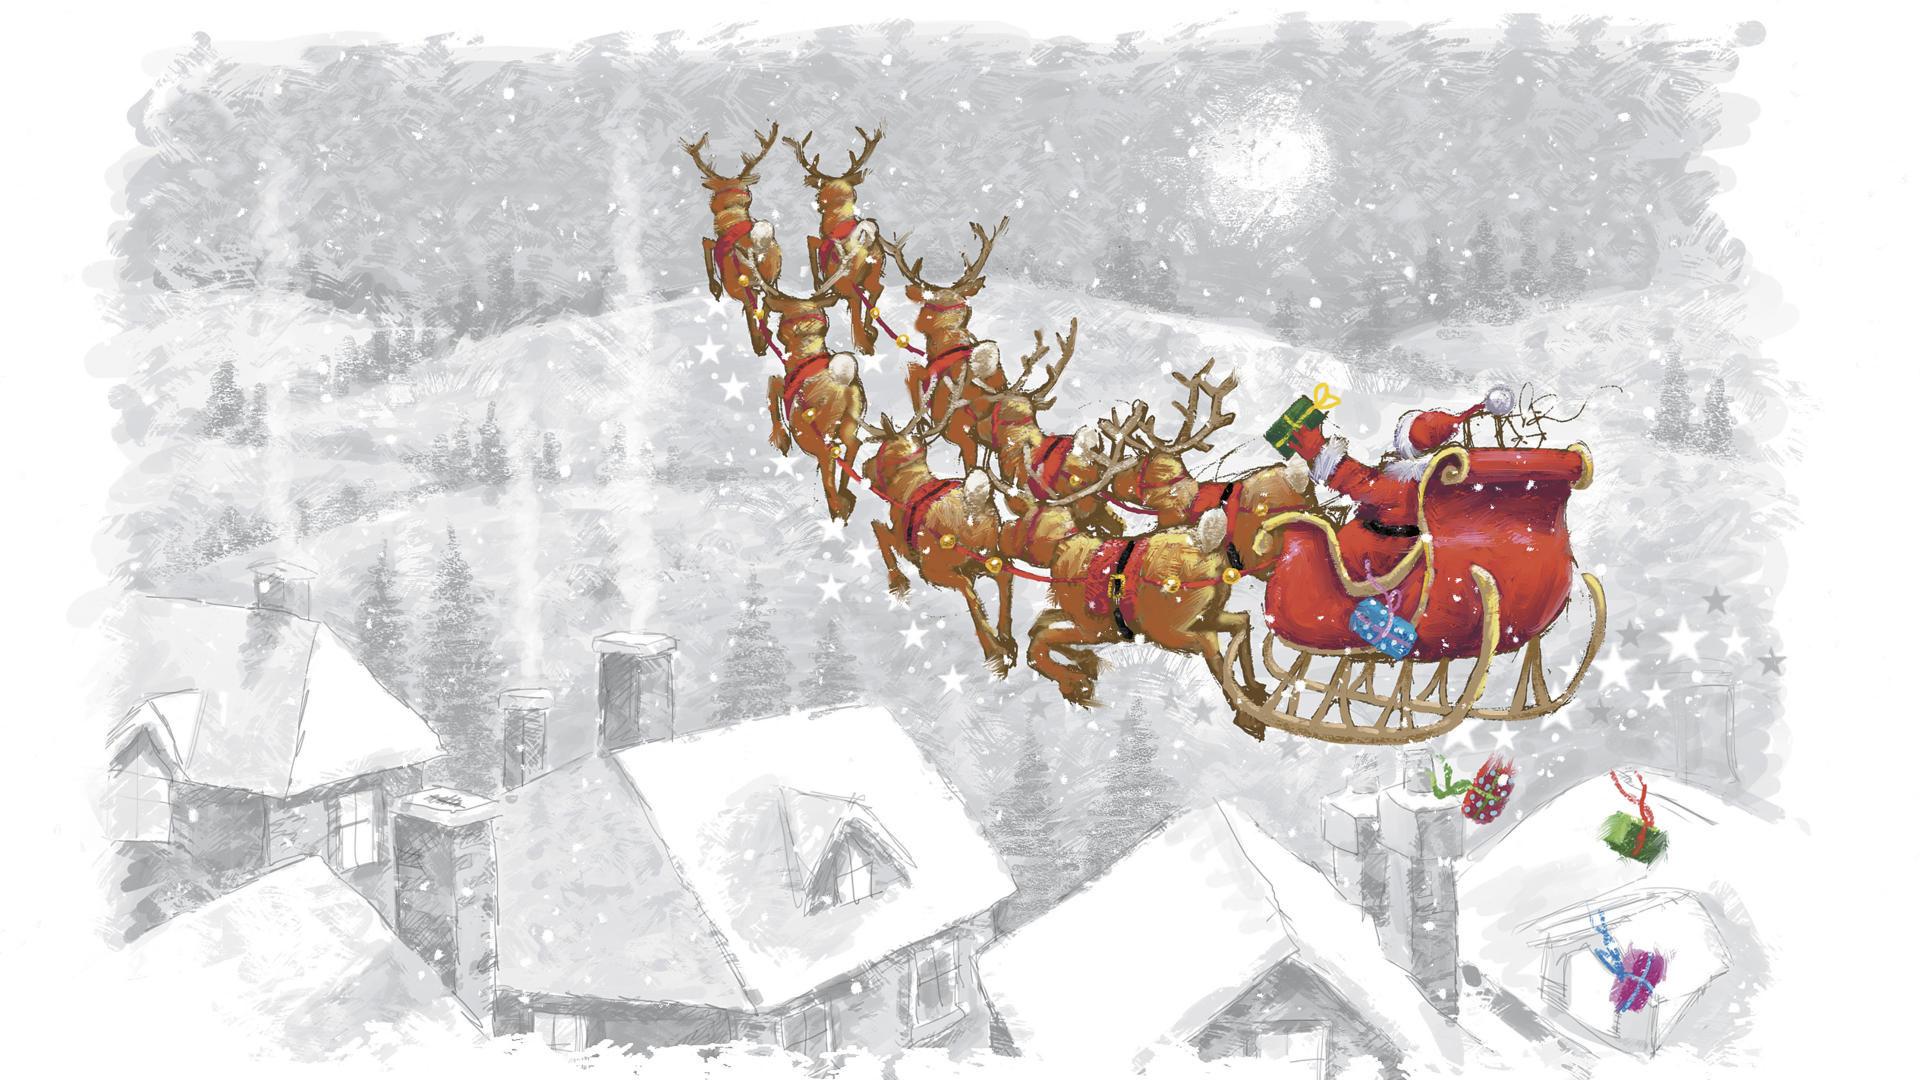 christmas sleigh horses 1920x1080 wallpaper - photo #23